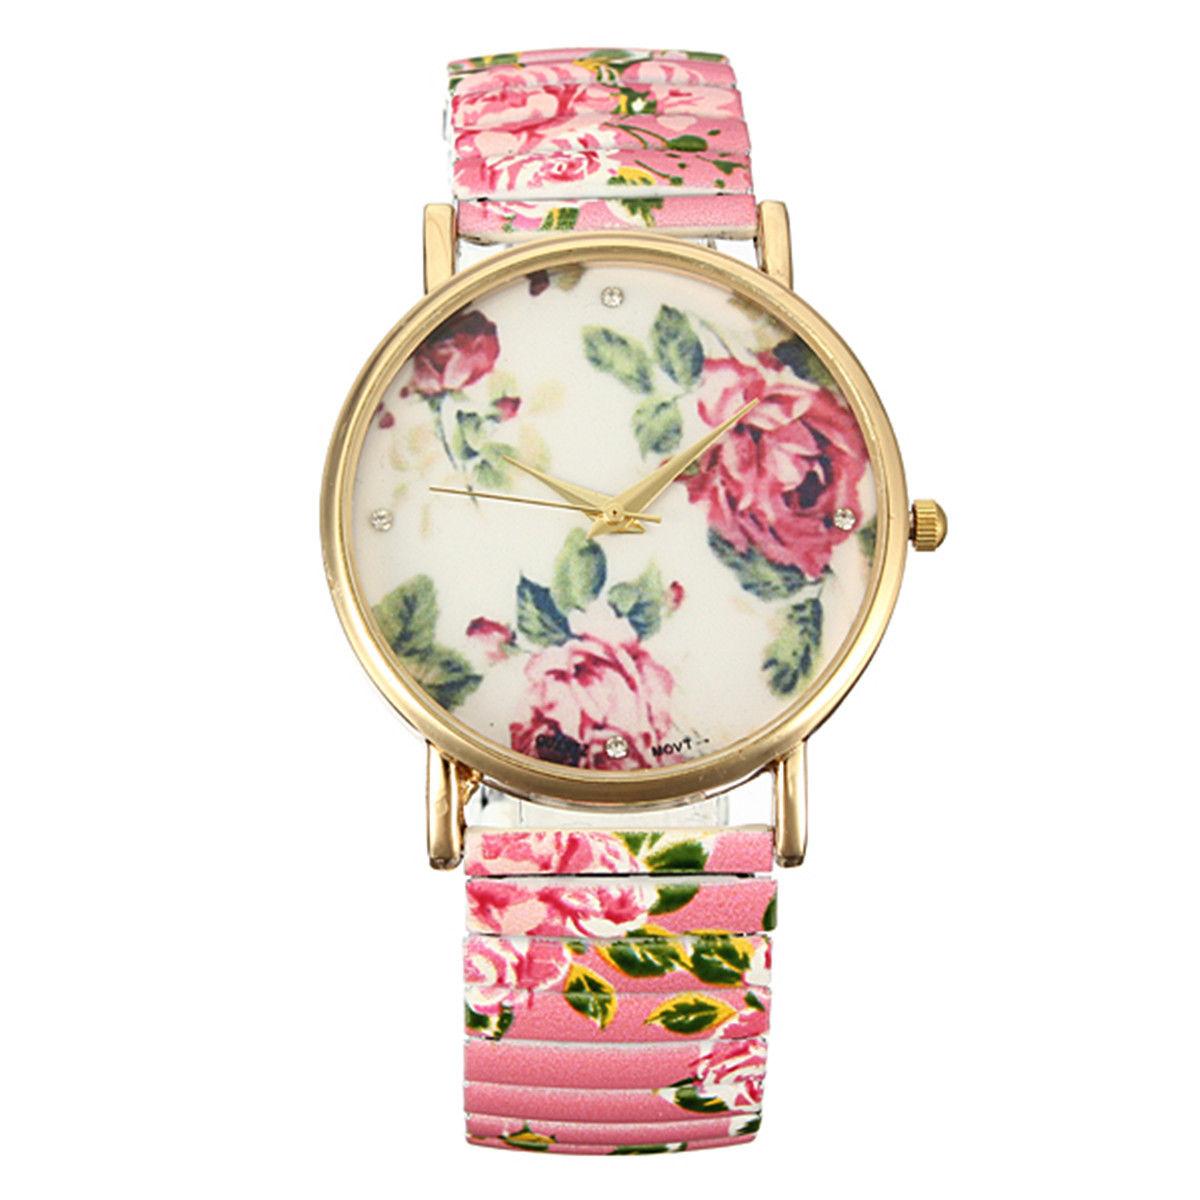 Flower Watch Elastic Band Watch Bracelet Watch Vintage